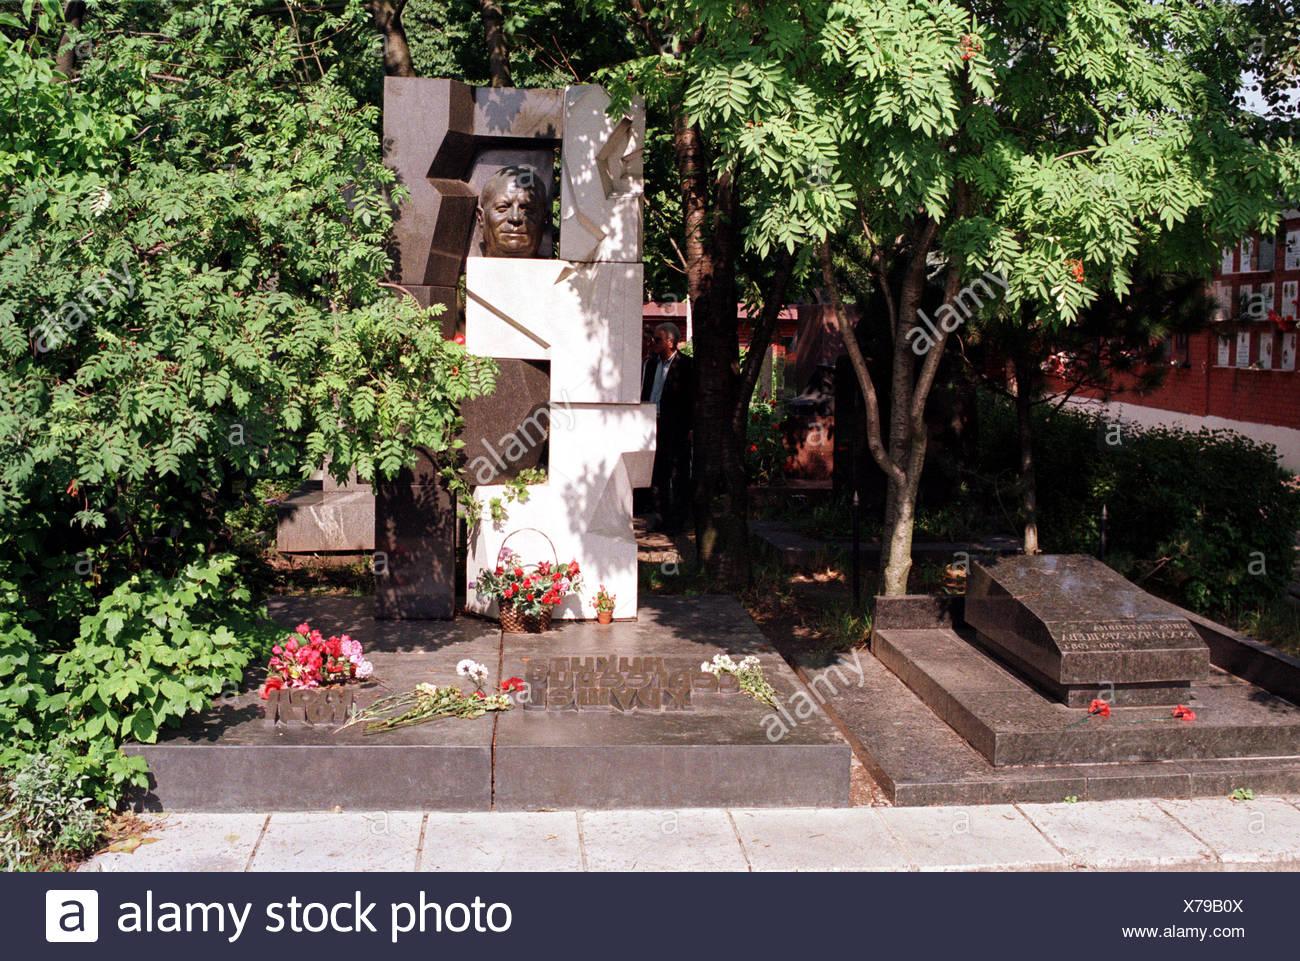 Moscow, tomb of Nikita Khrushchev - Stock Image